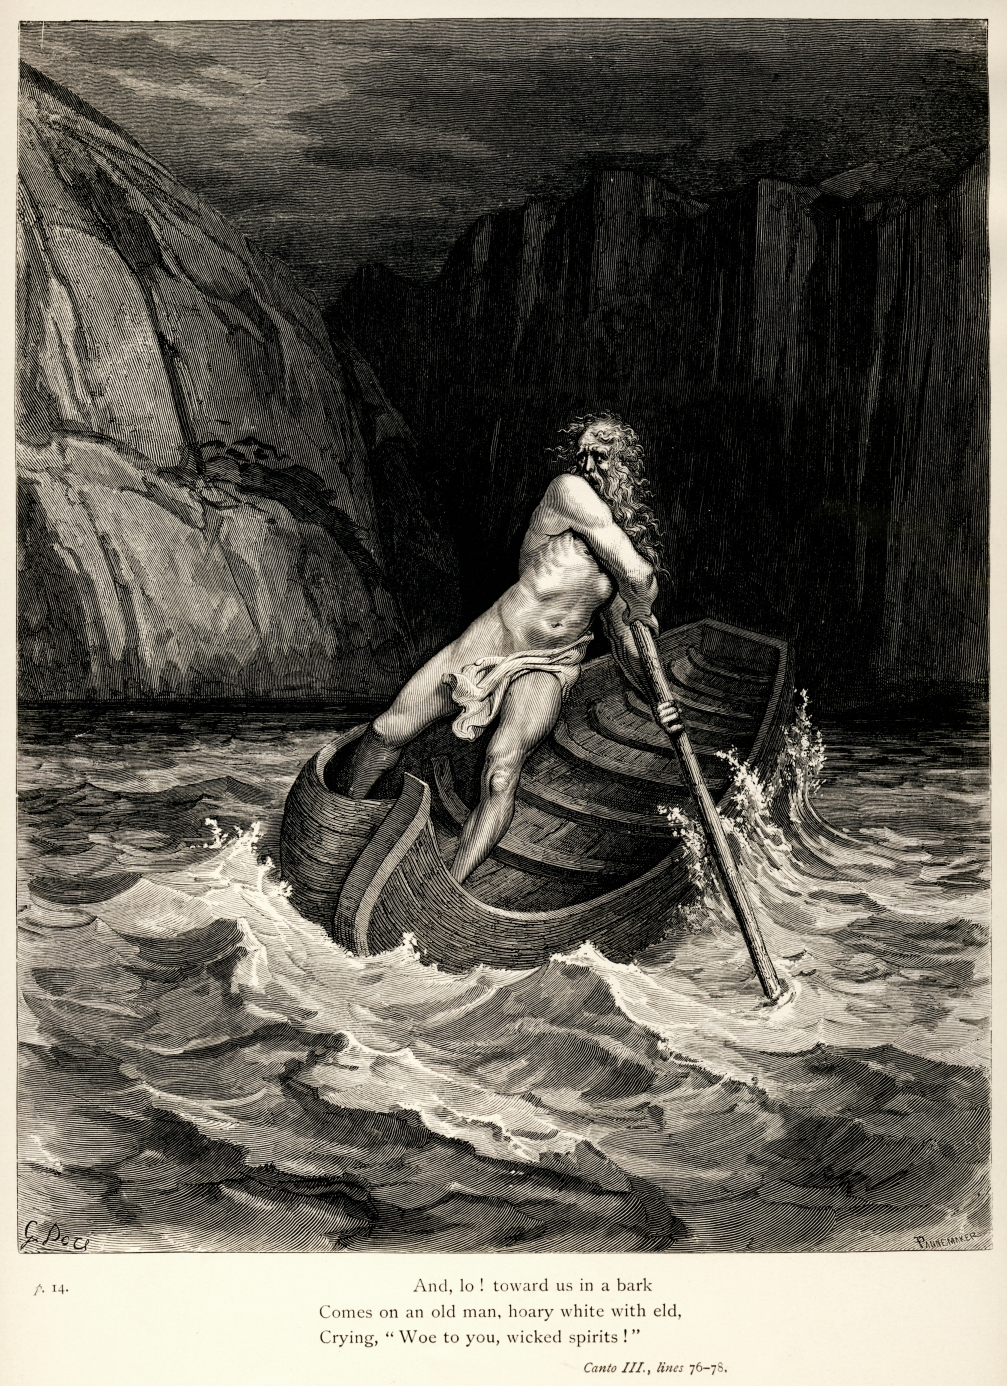 Gustave_Doré_-_Dante_Alighieri_-_Inferno_-_Plate_9_(Canto_III_-_Charon).jpg